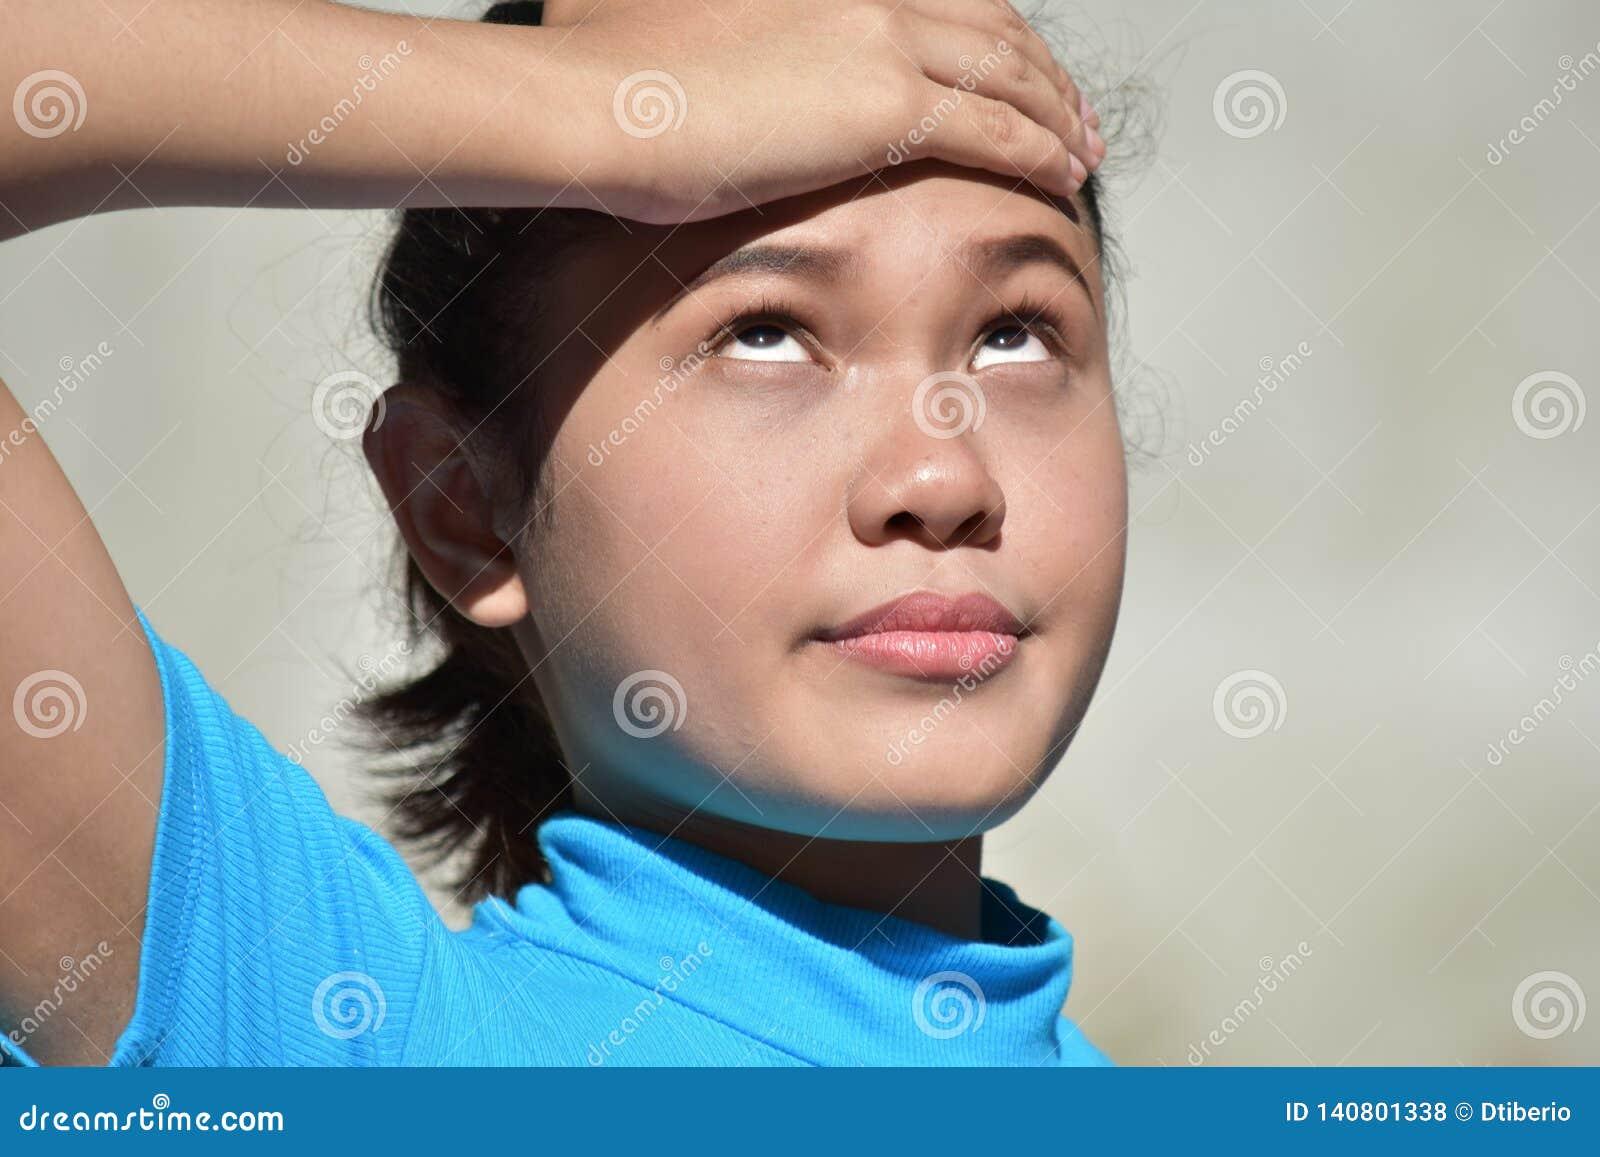 Filipina Female With Headache jovem